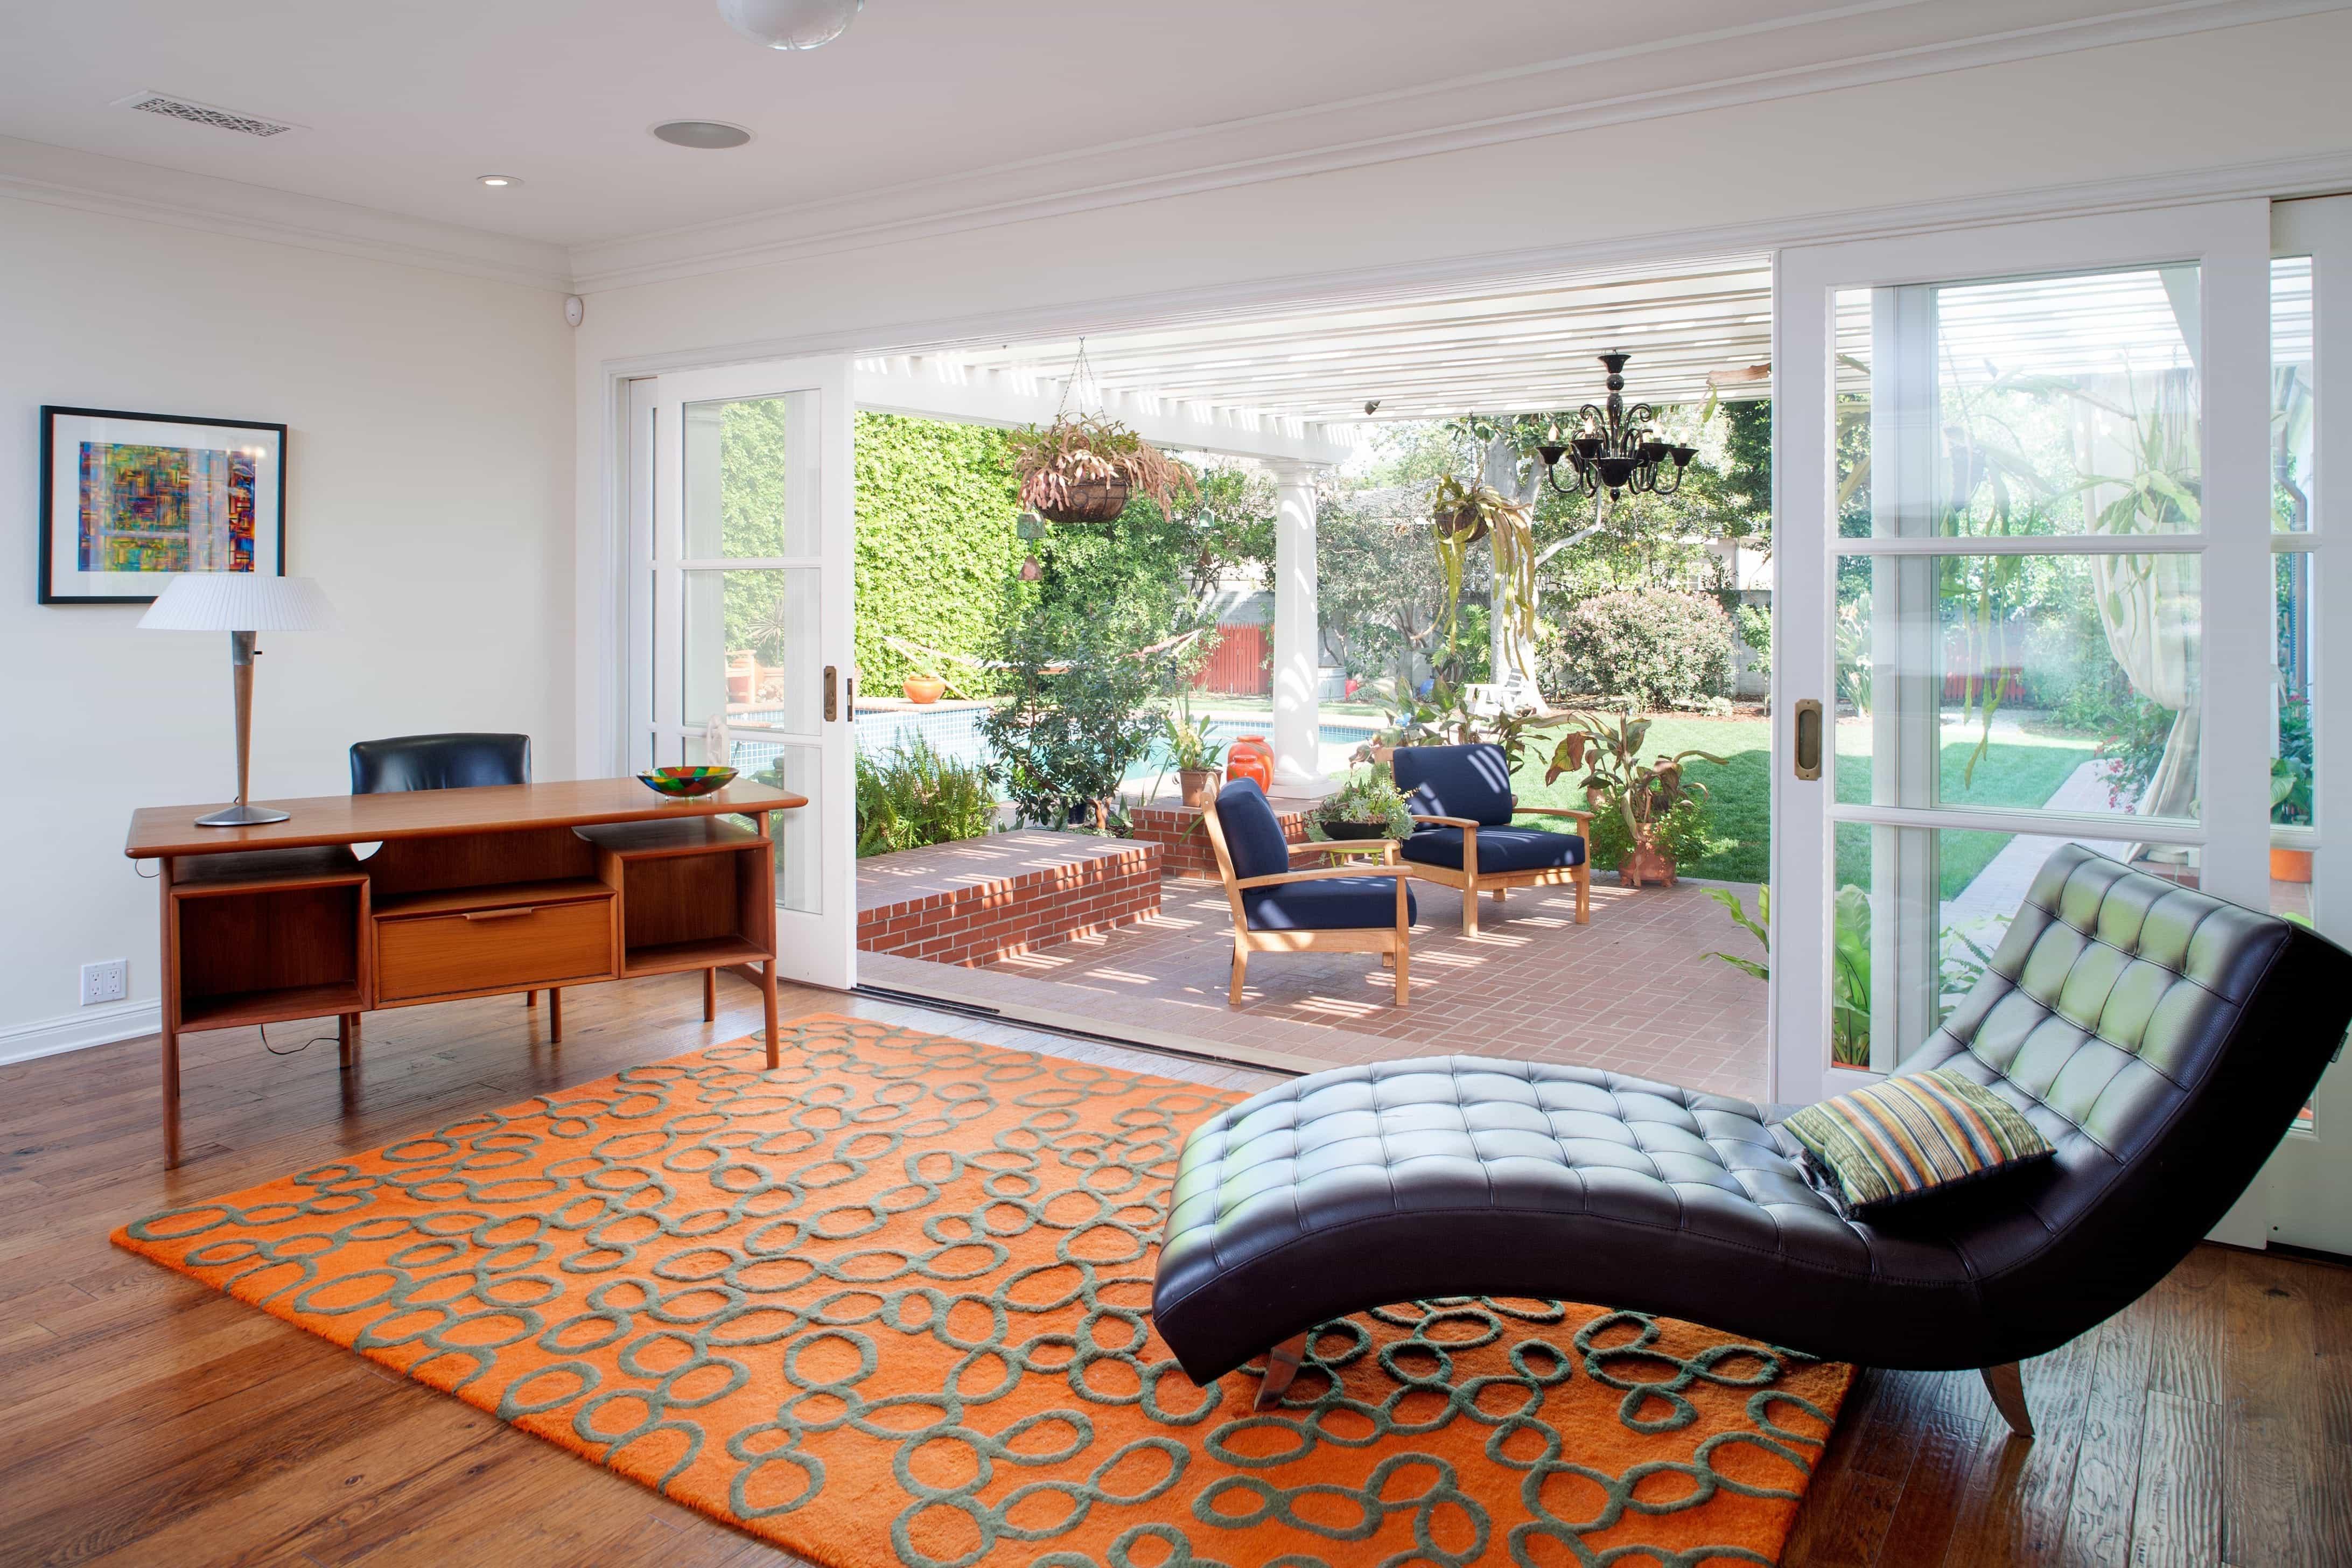 Featured Image of Modern Indoor Outdoor Living Room With Sliding Glass Doors